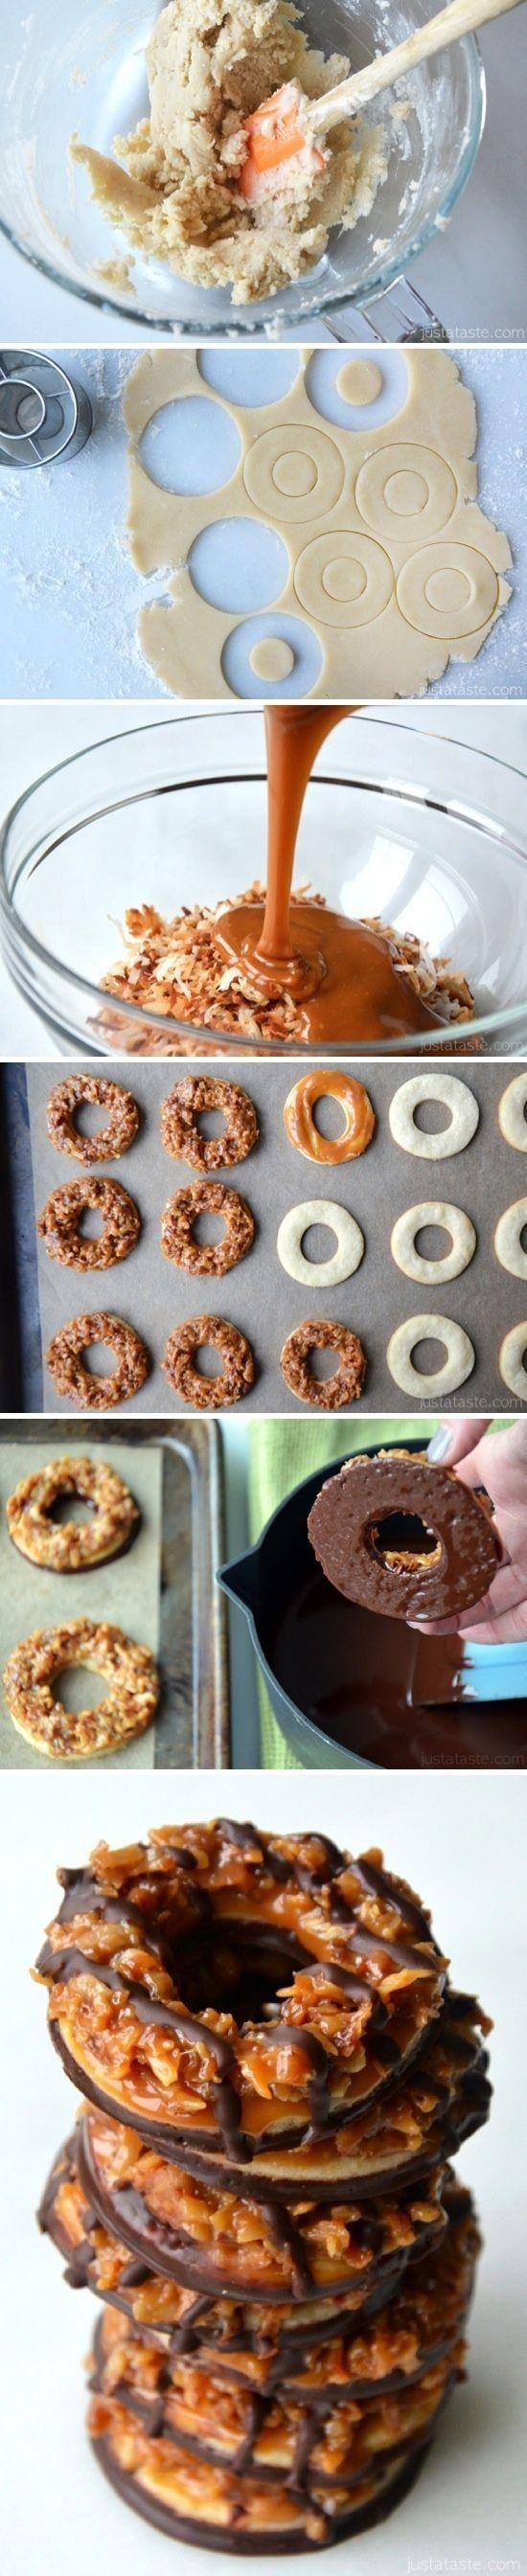 Homemade Samoas Girl Scout Cookies... #recipes #popular